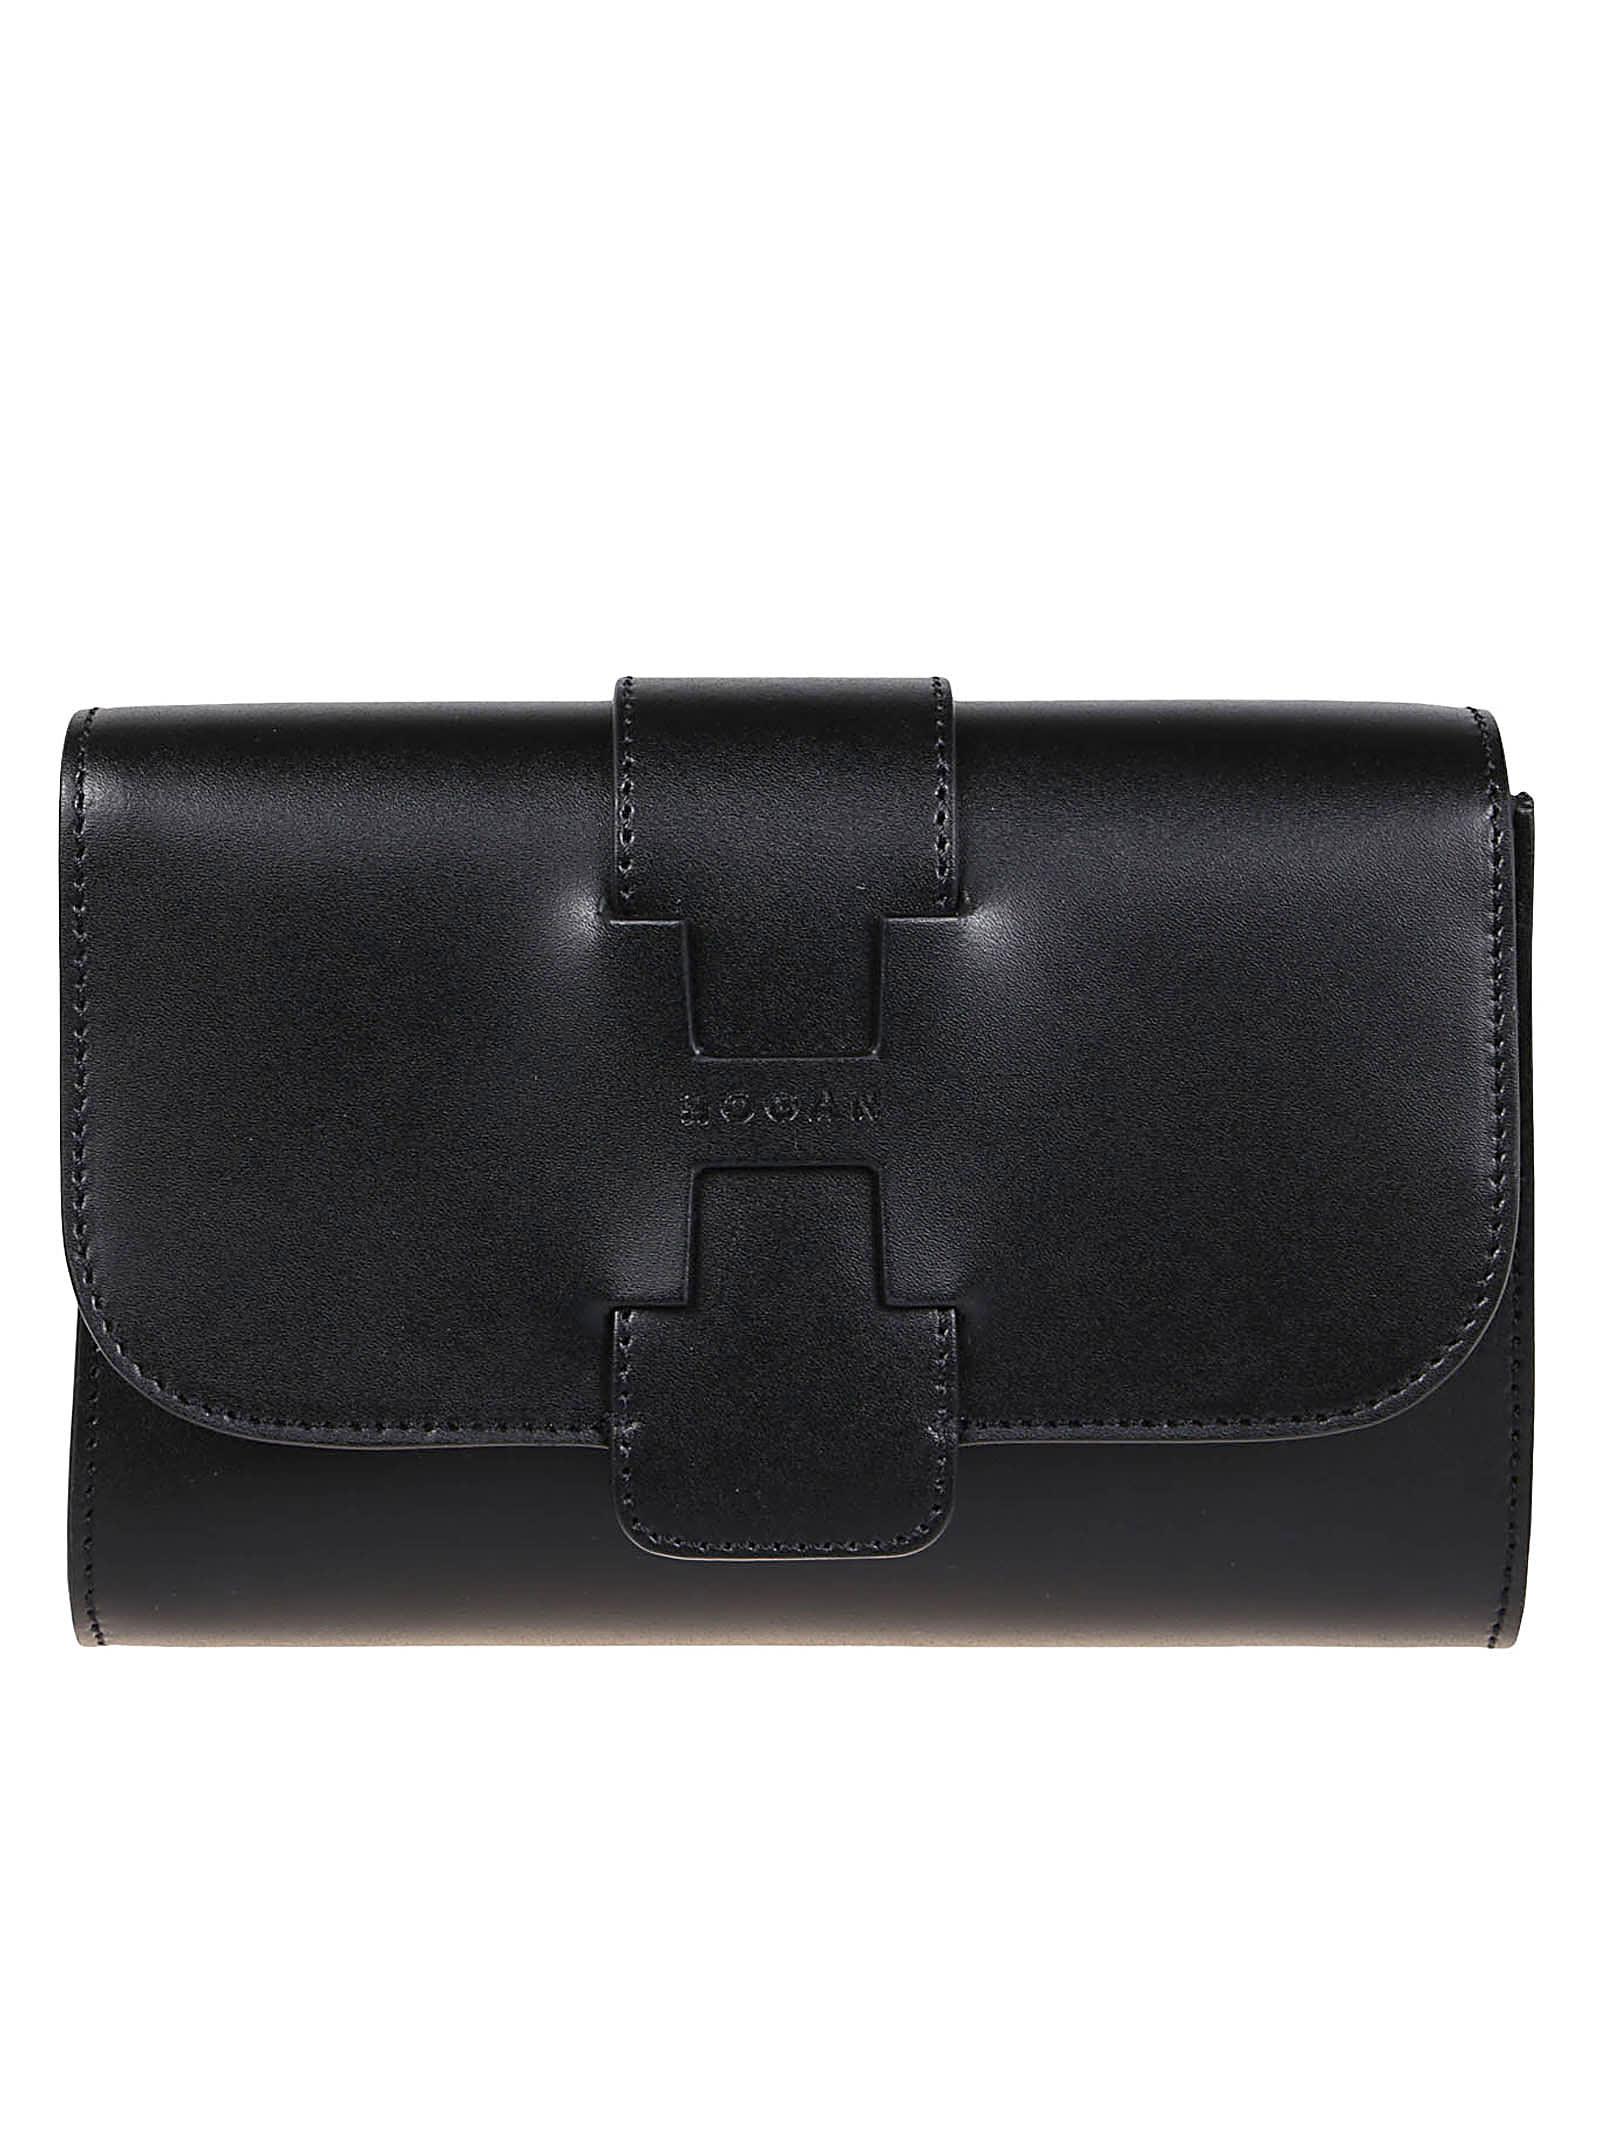 Hogan Black Leather Bag